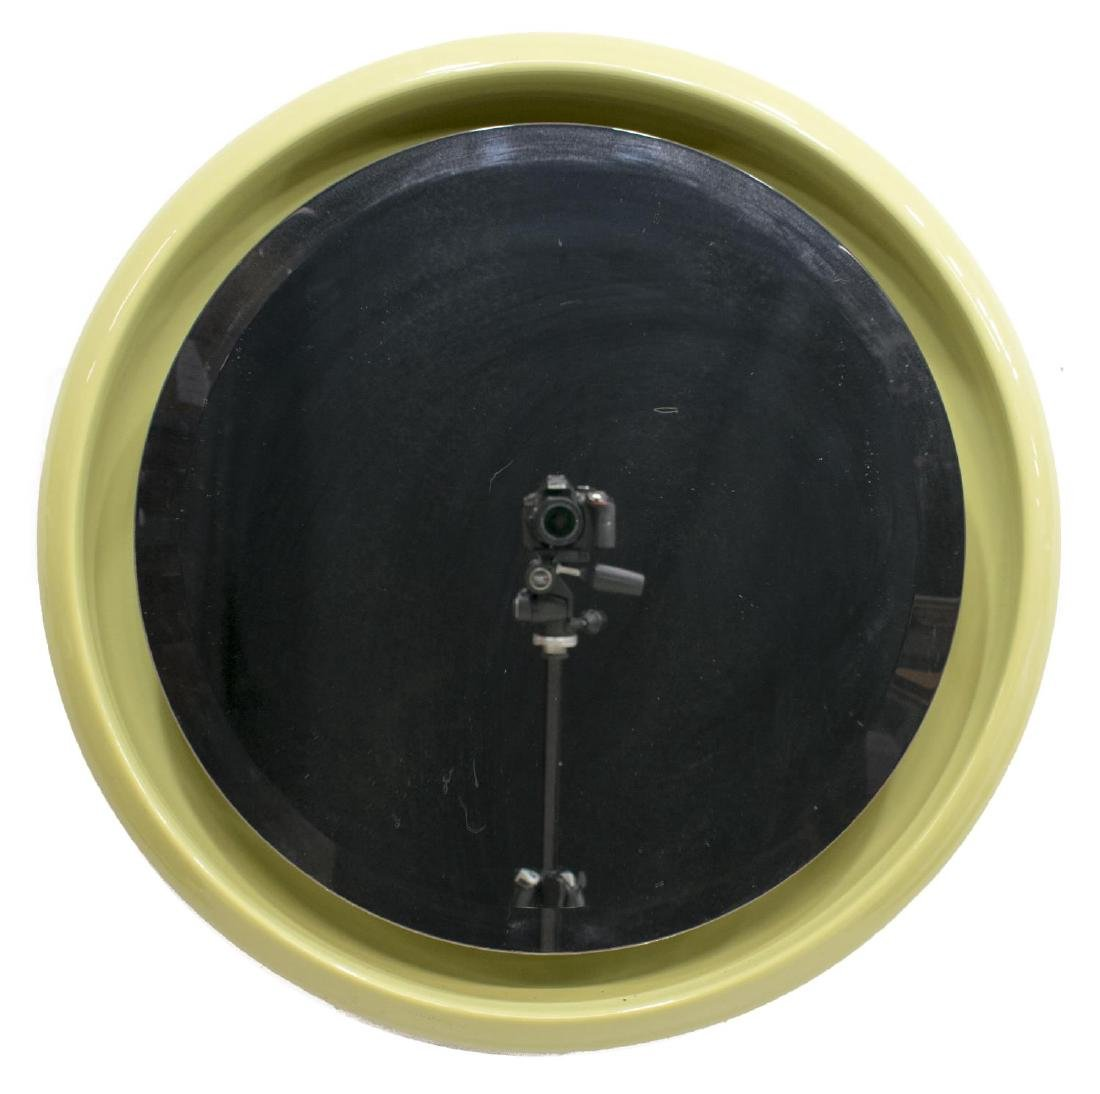 ITALIAN MODERN LIGHTED CIRCULAR BEVEL WALL MIRROR - 2